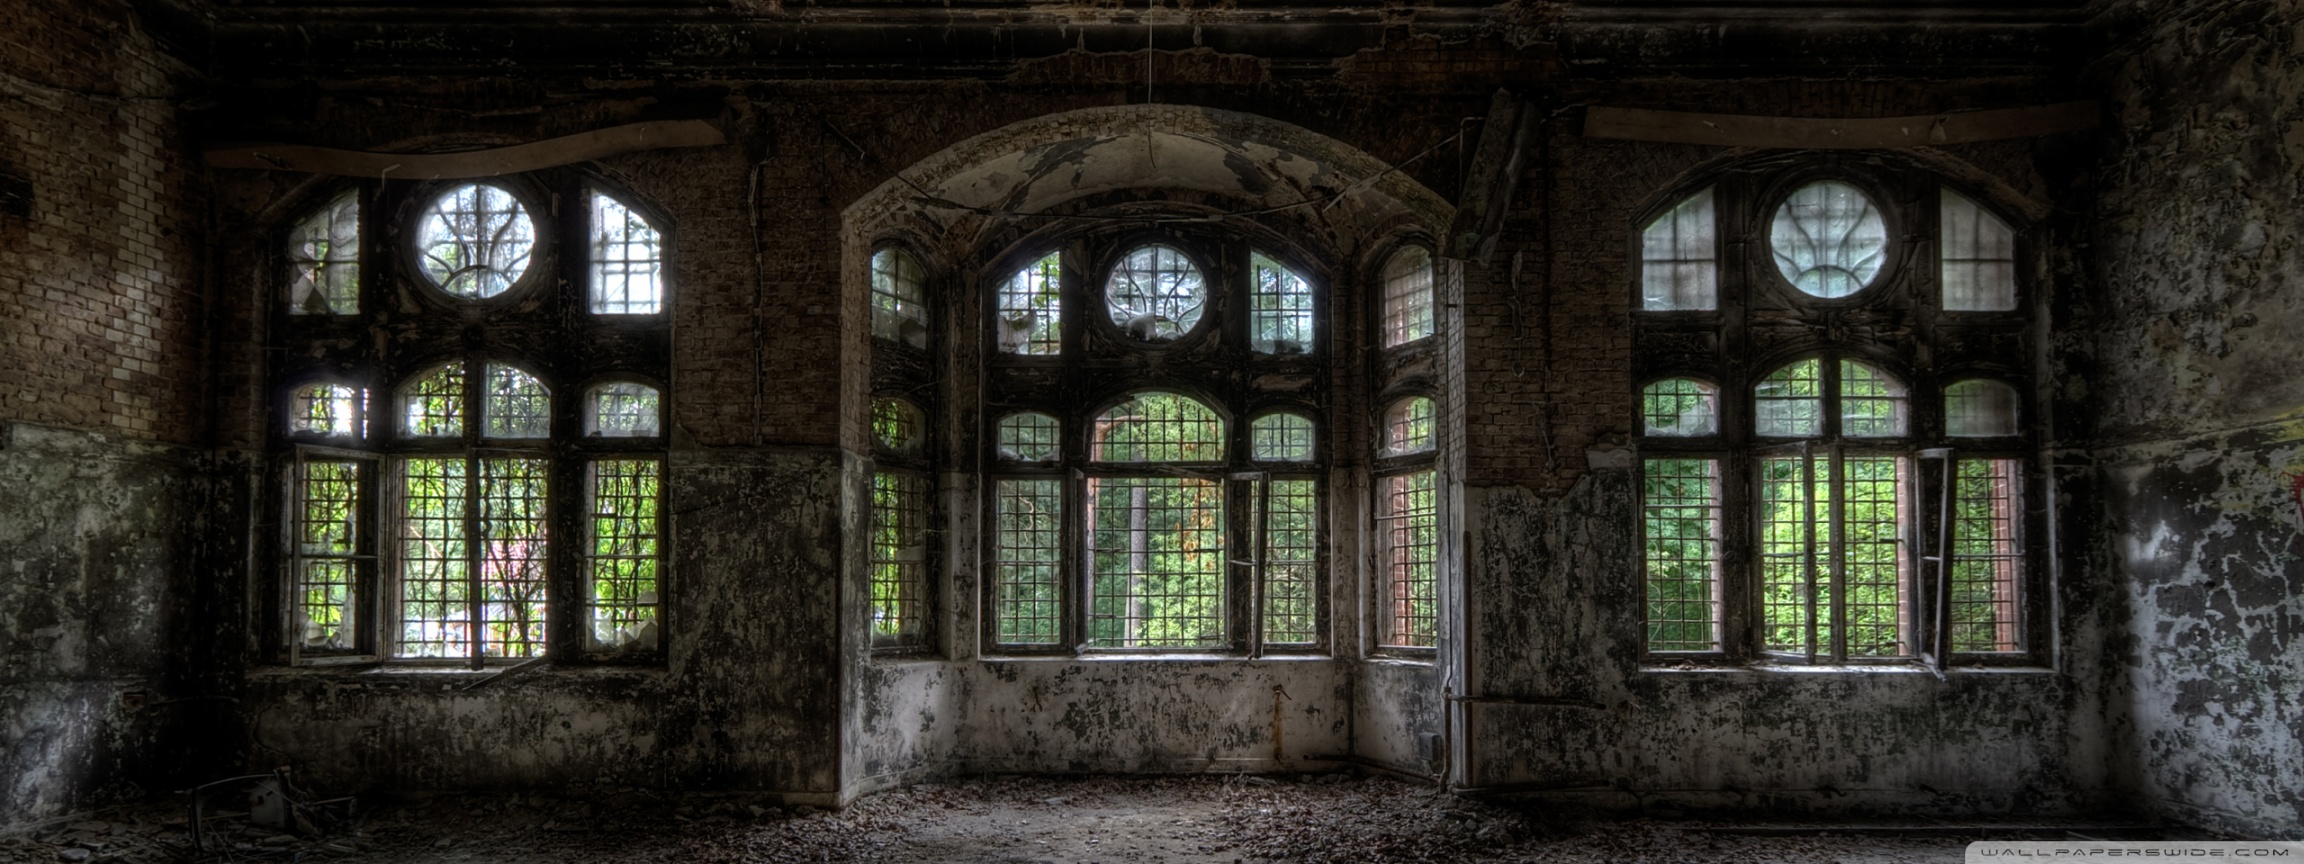 Empty Room In Old Building ❤ 4K HD Desktop Wallpaper for 4K Ultra ...